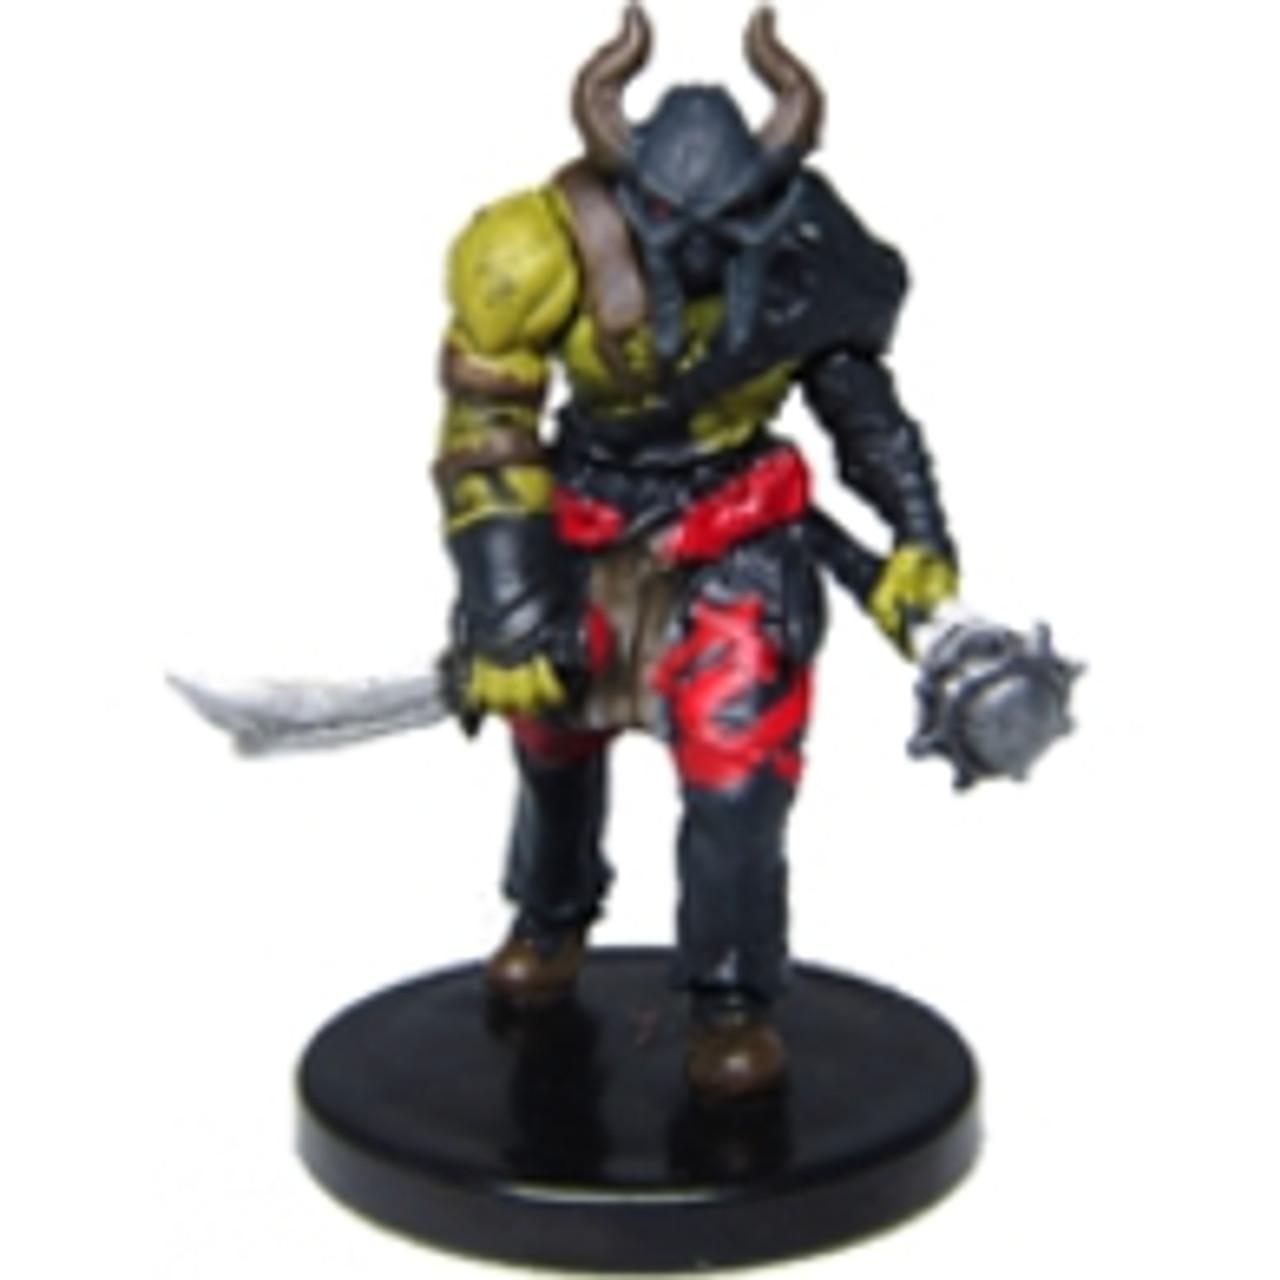 Half Orc Adept #38 Dungeons Deep Pathfinder D&D Miniatures